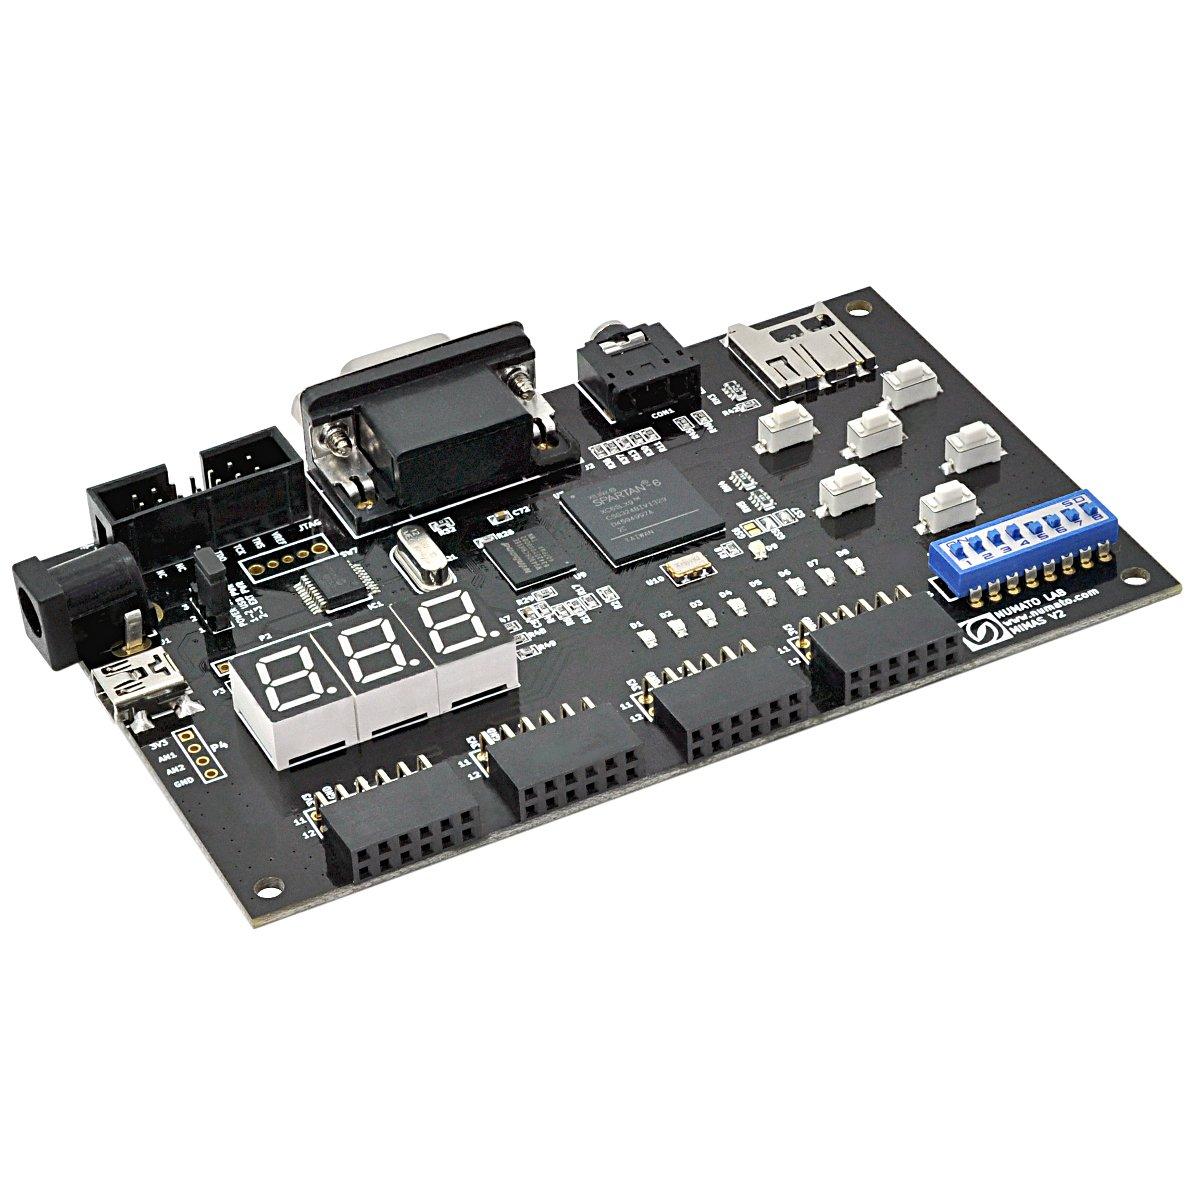 NUMATO LAB Mimas V2 Spartan 6 FPGA Development Board with DDR SDRAM by NUMATO LAB